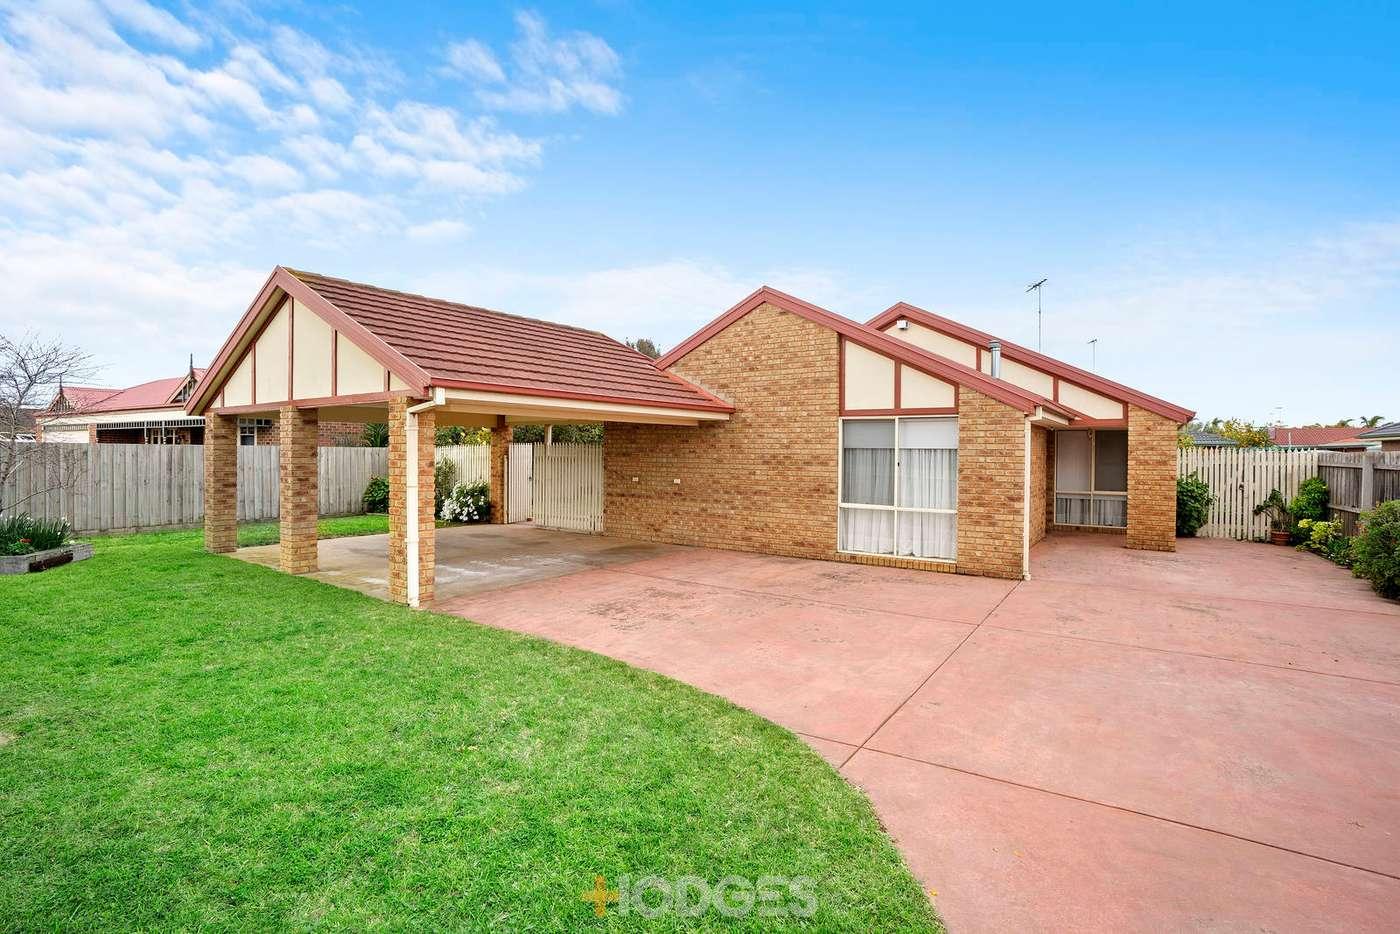 Main view of Homely house listing, 10 Loretta Close, Lara, VIC 3212